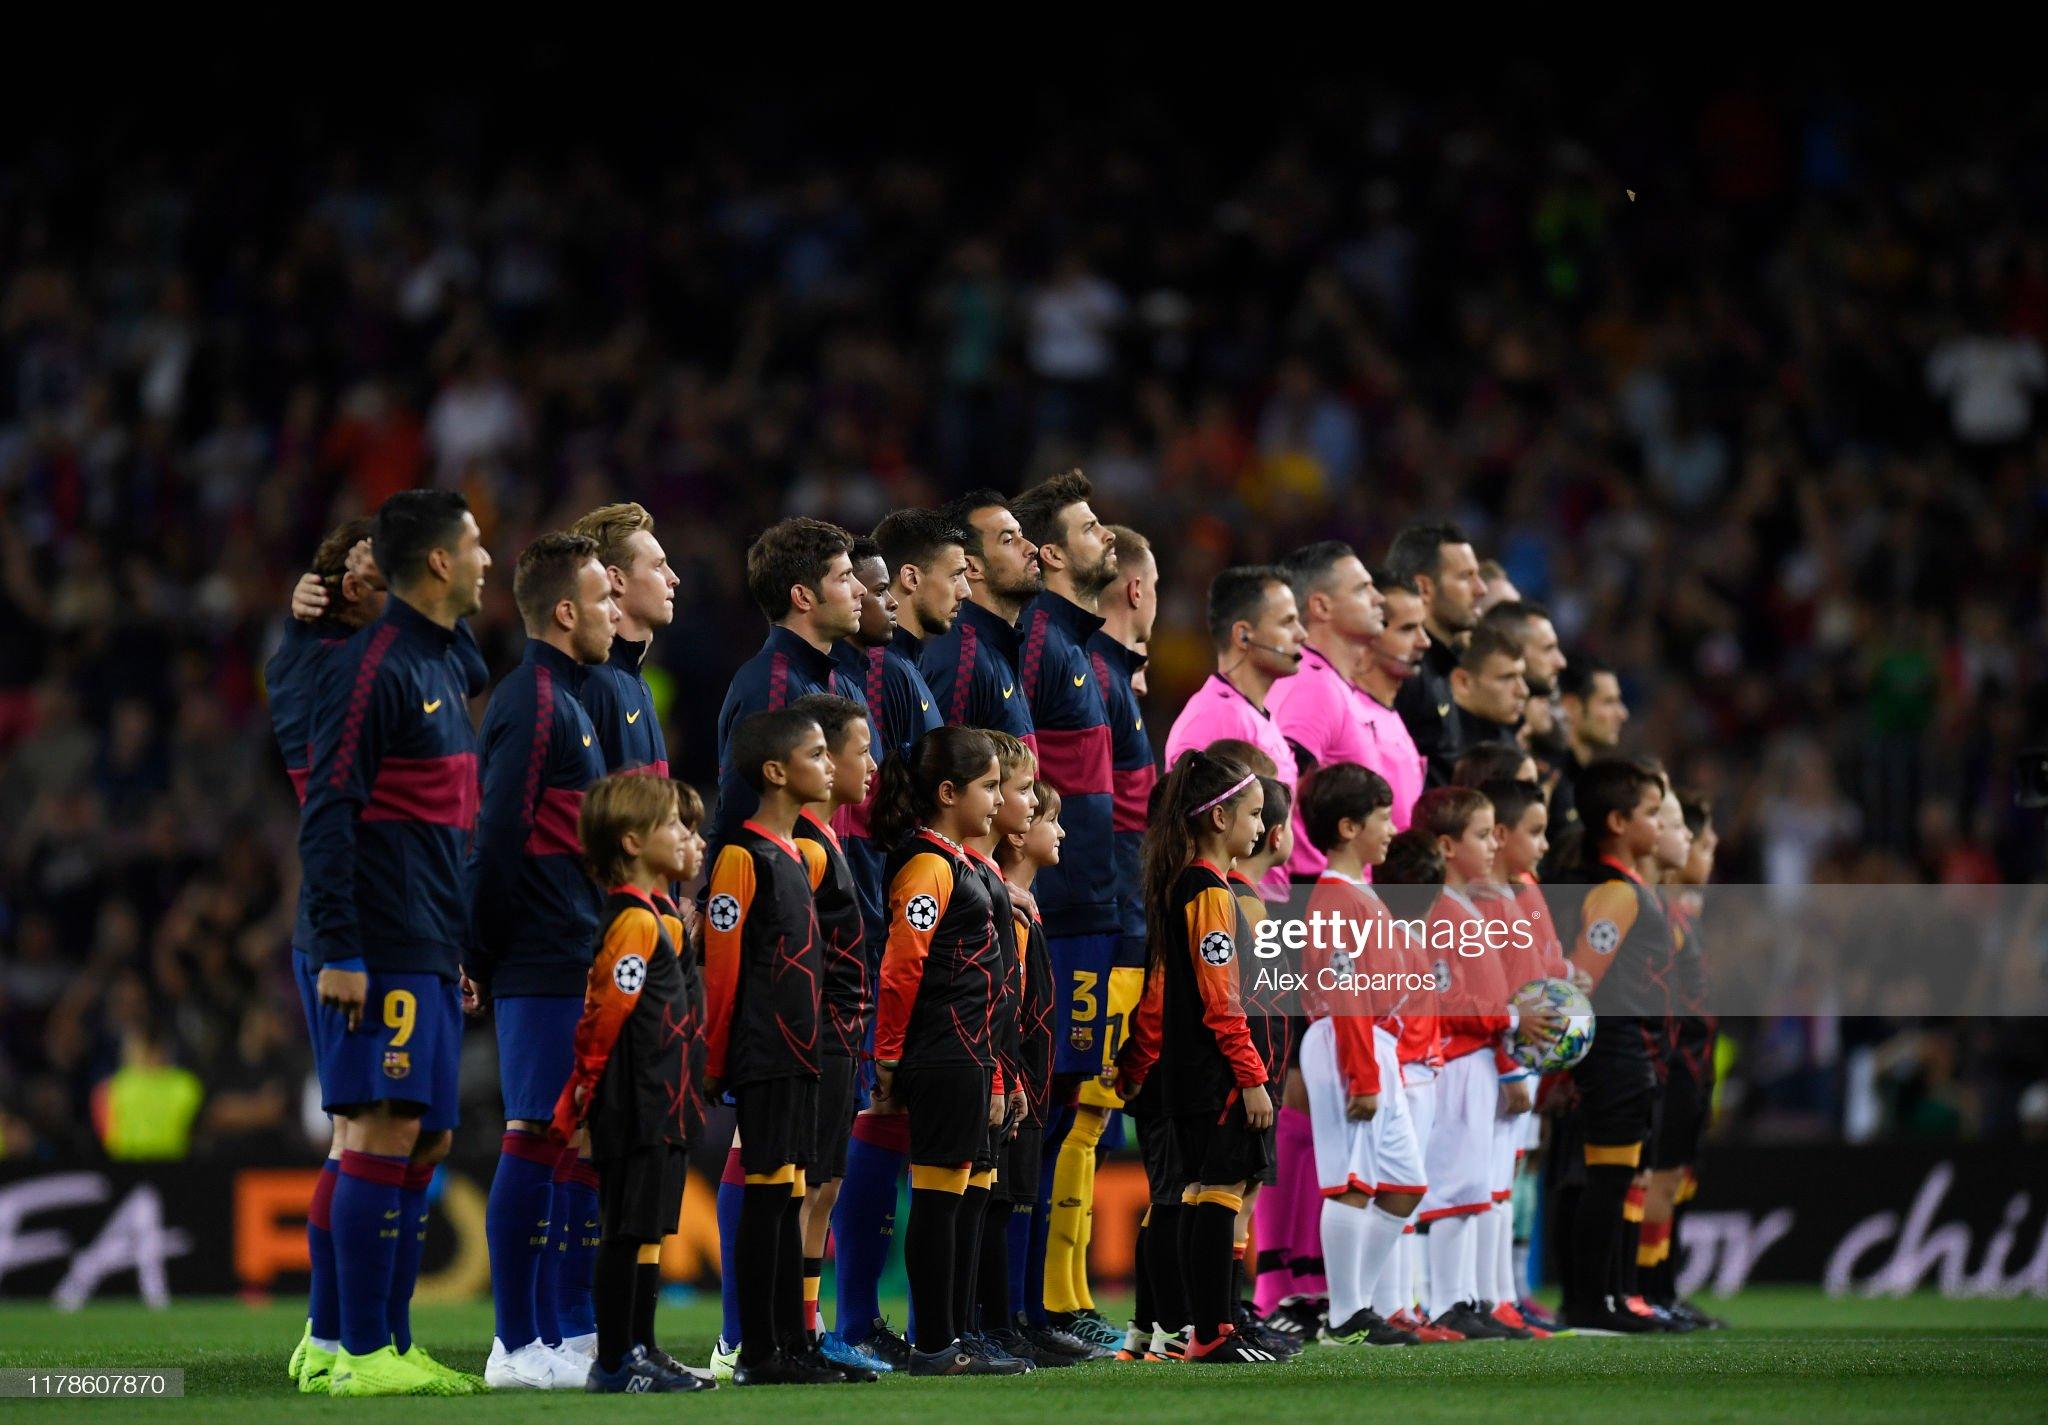 صور مباراة : برشلونة - إنتر 2-1 ( 02-10-2019 )  The-two-sides-line-up-prior-to-the-uefa-champions-league-group-f-fc-picture-id1178607870?s=2048x2048